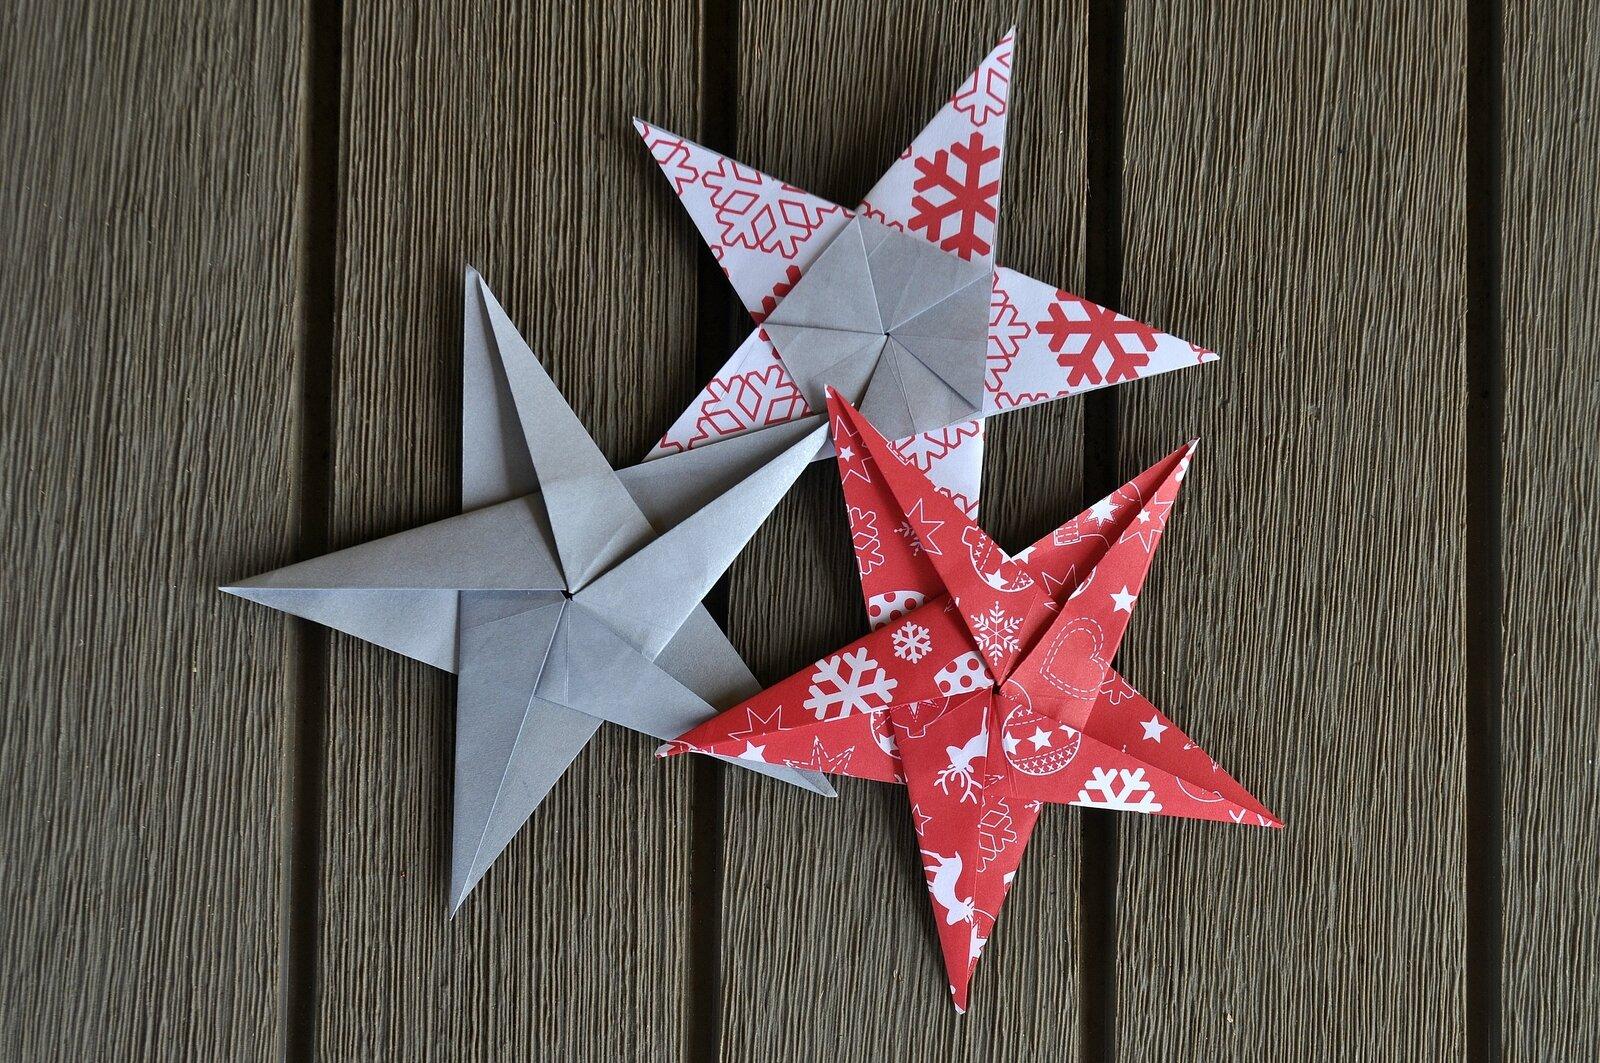 des toiles de no l en origami avec le tuto c des. Black Bedroom Furniture Sets. Home Design Ideas